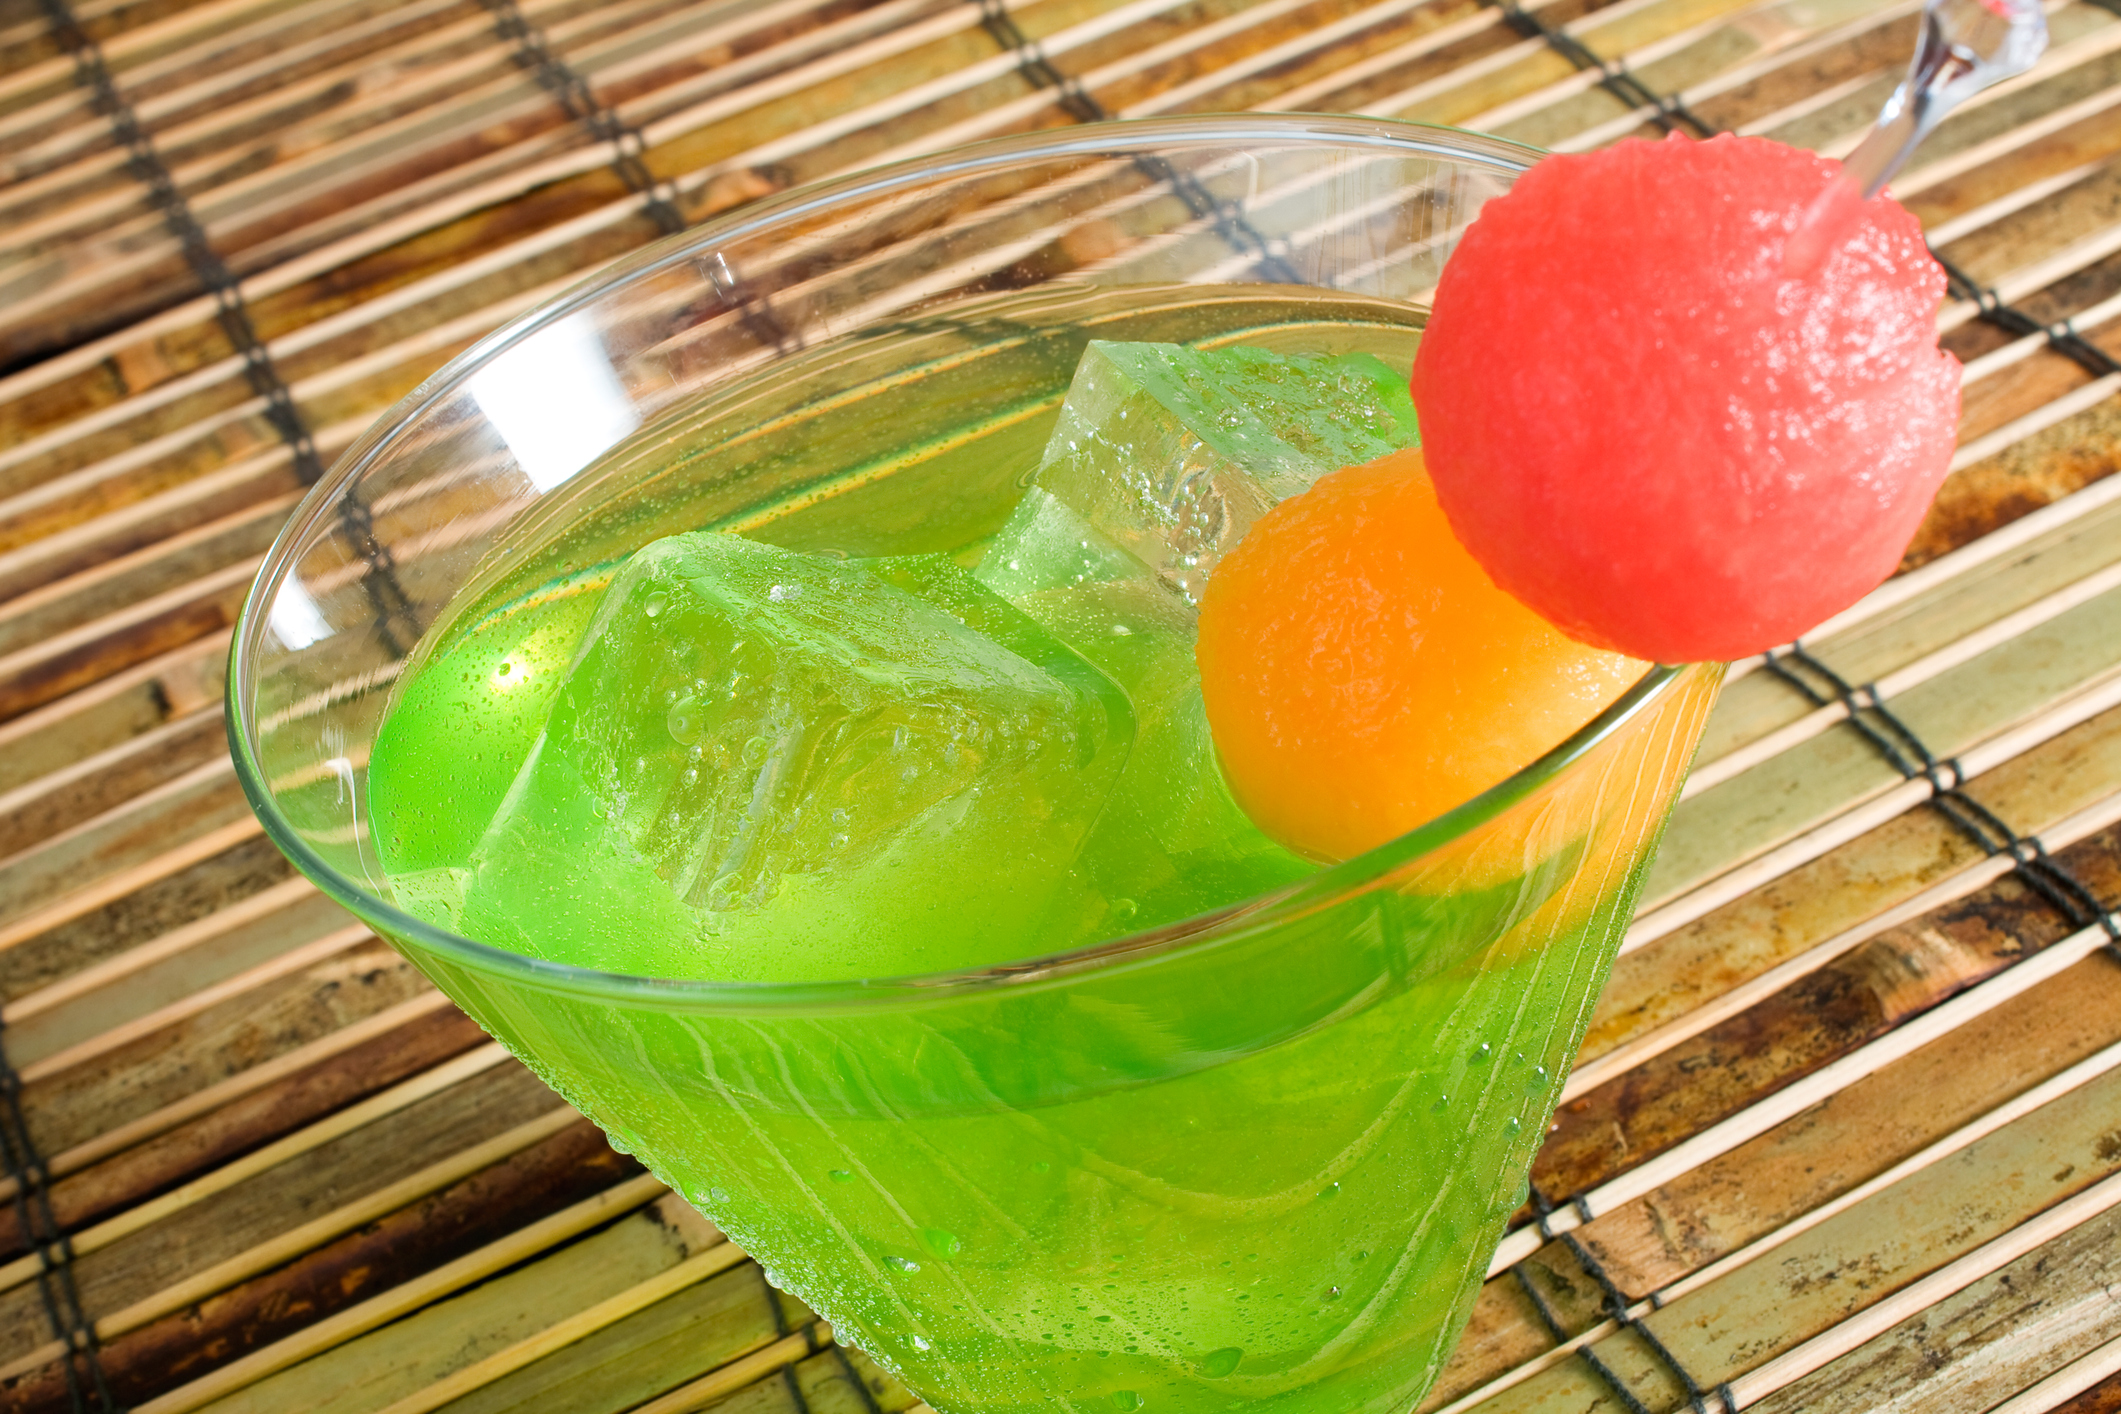 Midori Drink Recipes | LoveToKnow